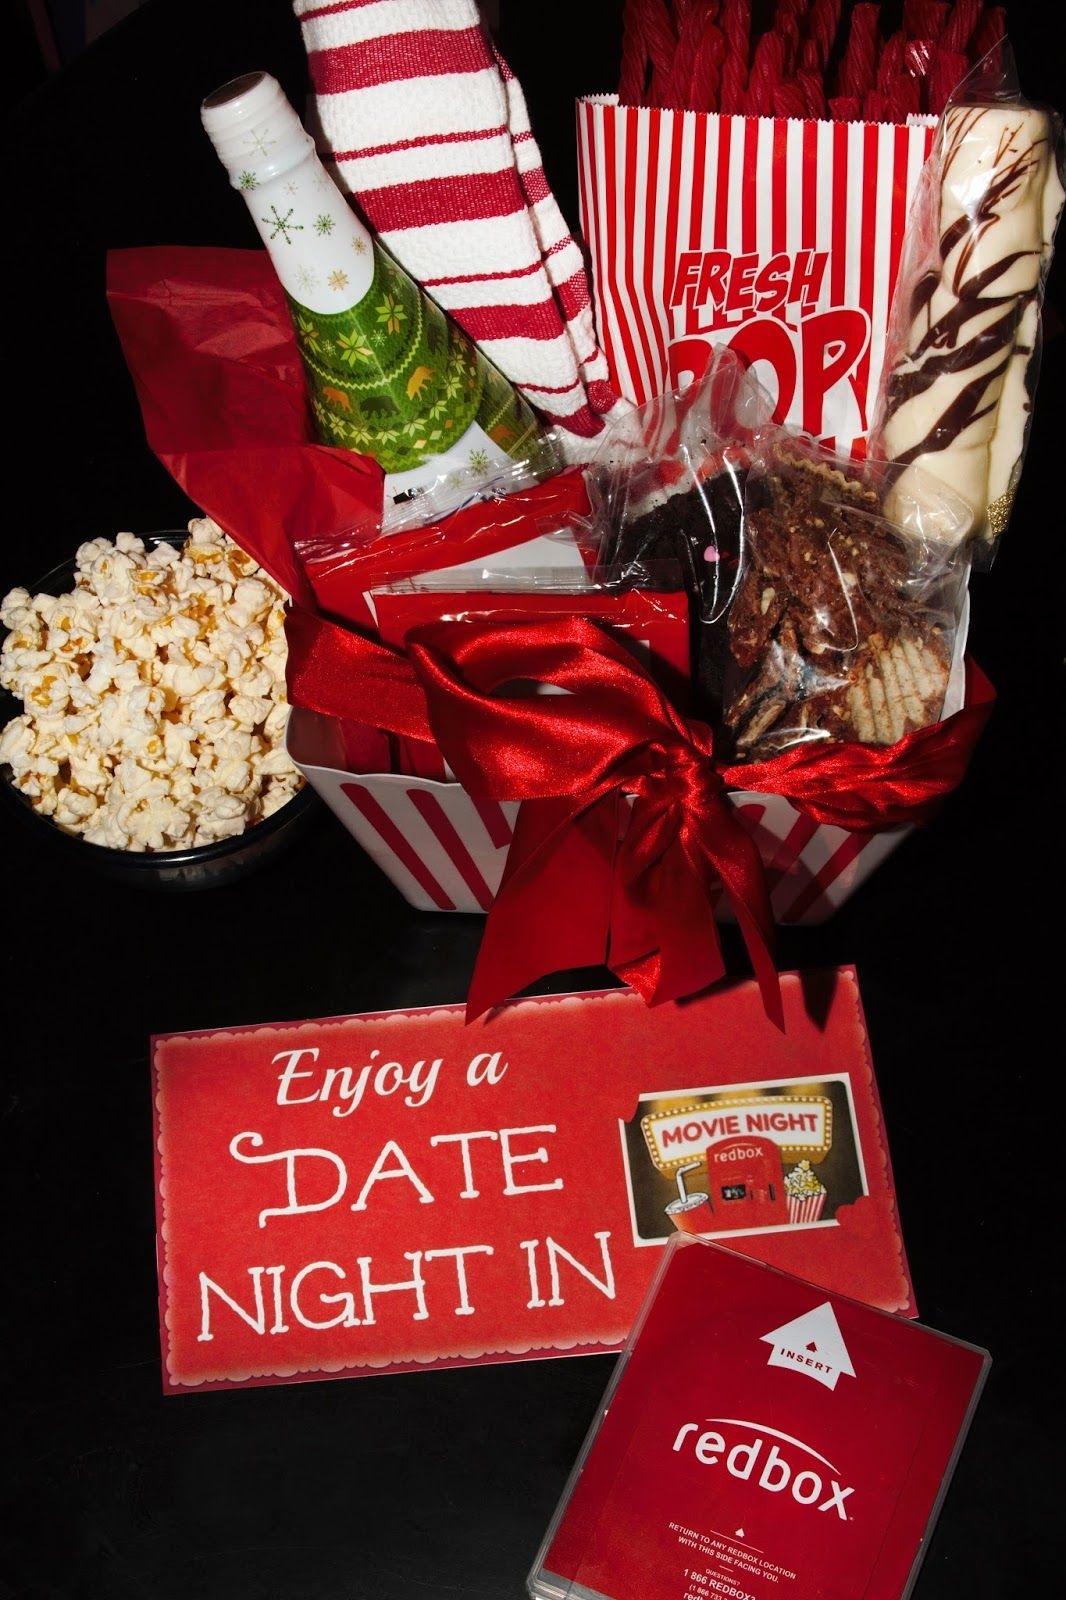 DIY Date Night In Gift Basket with Redbox | Free printable, Gift ...